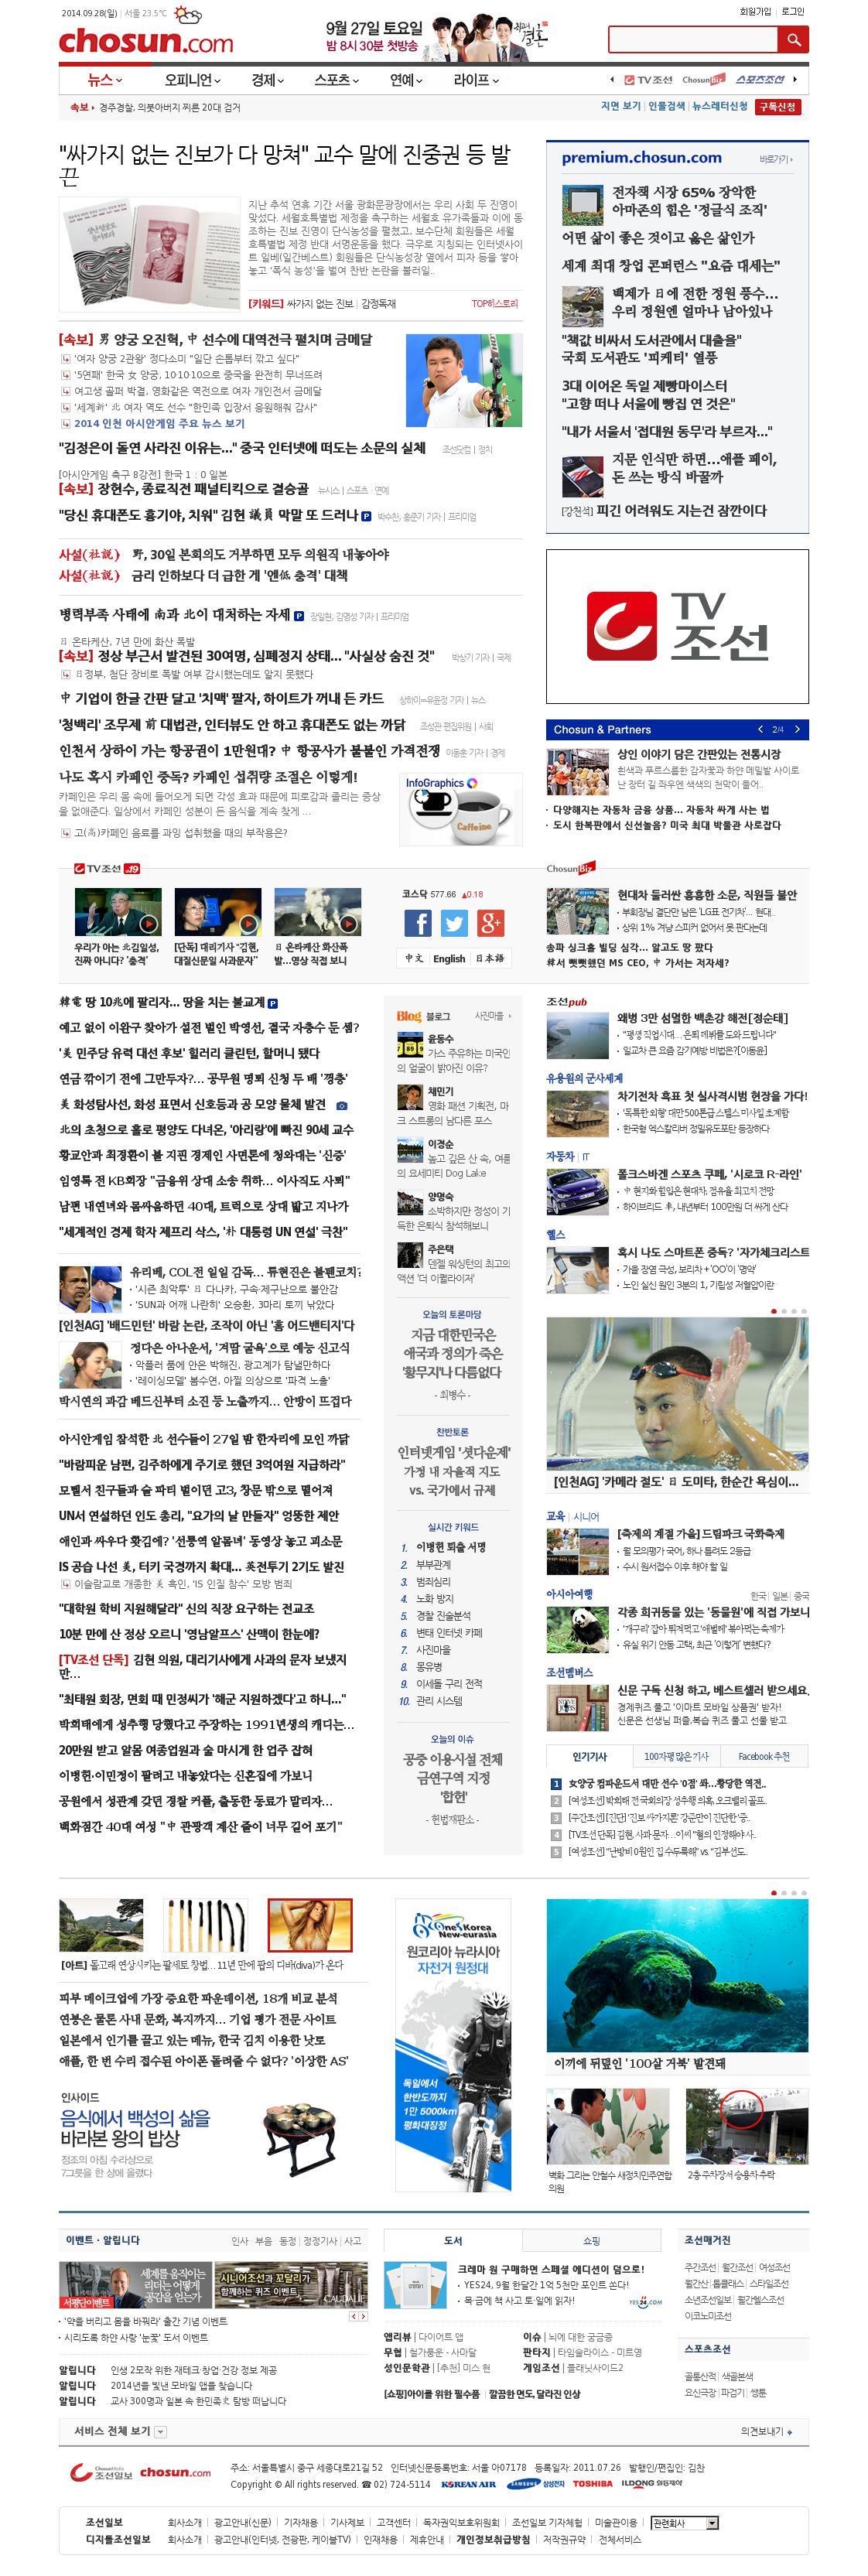 chosun.com at Sunday Sept. 28, 2014, 10:01 a.m. UTC